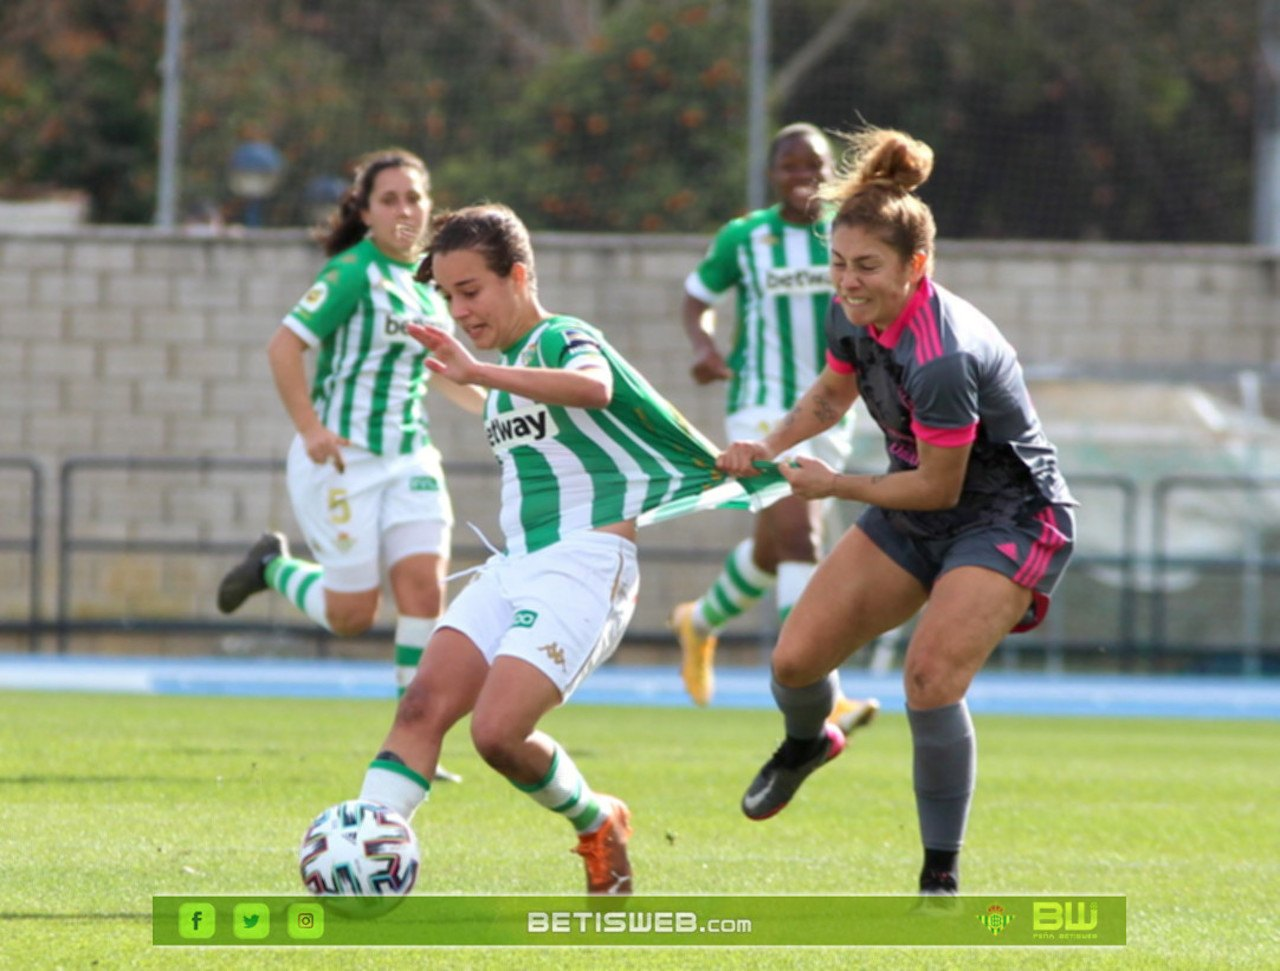 aJ16-–-Real-Betis-Fem-vs-Madrid-CFF217